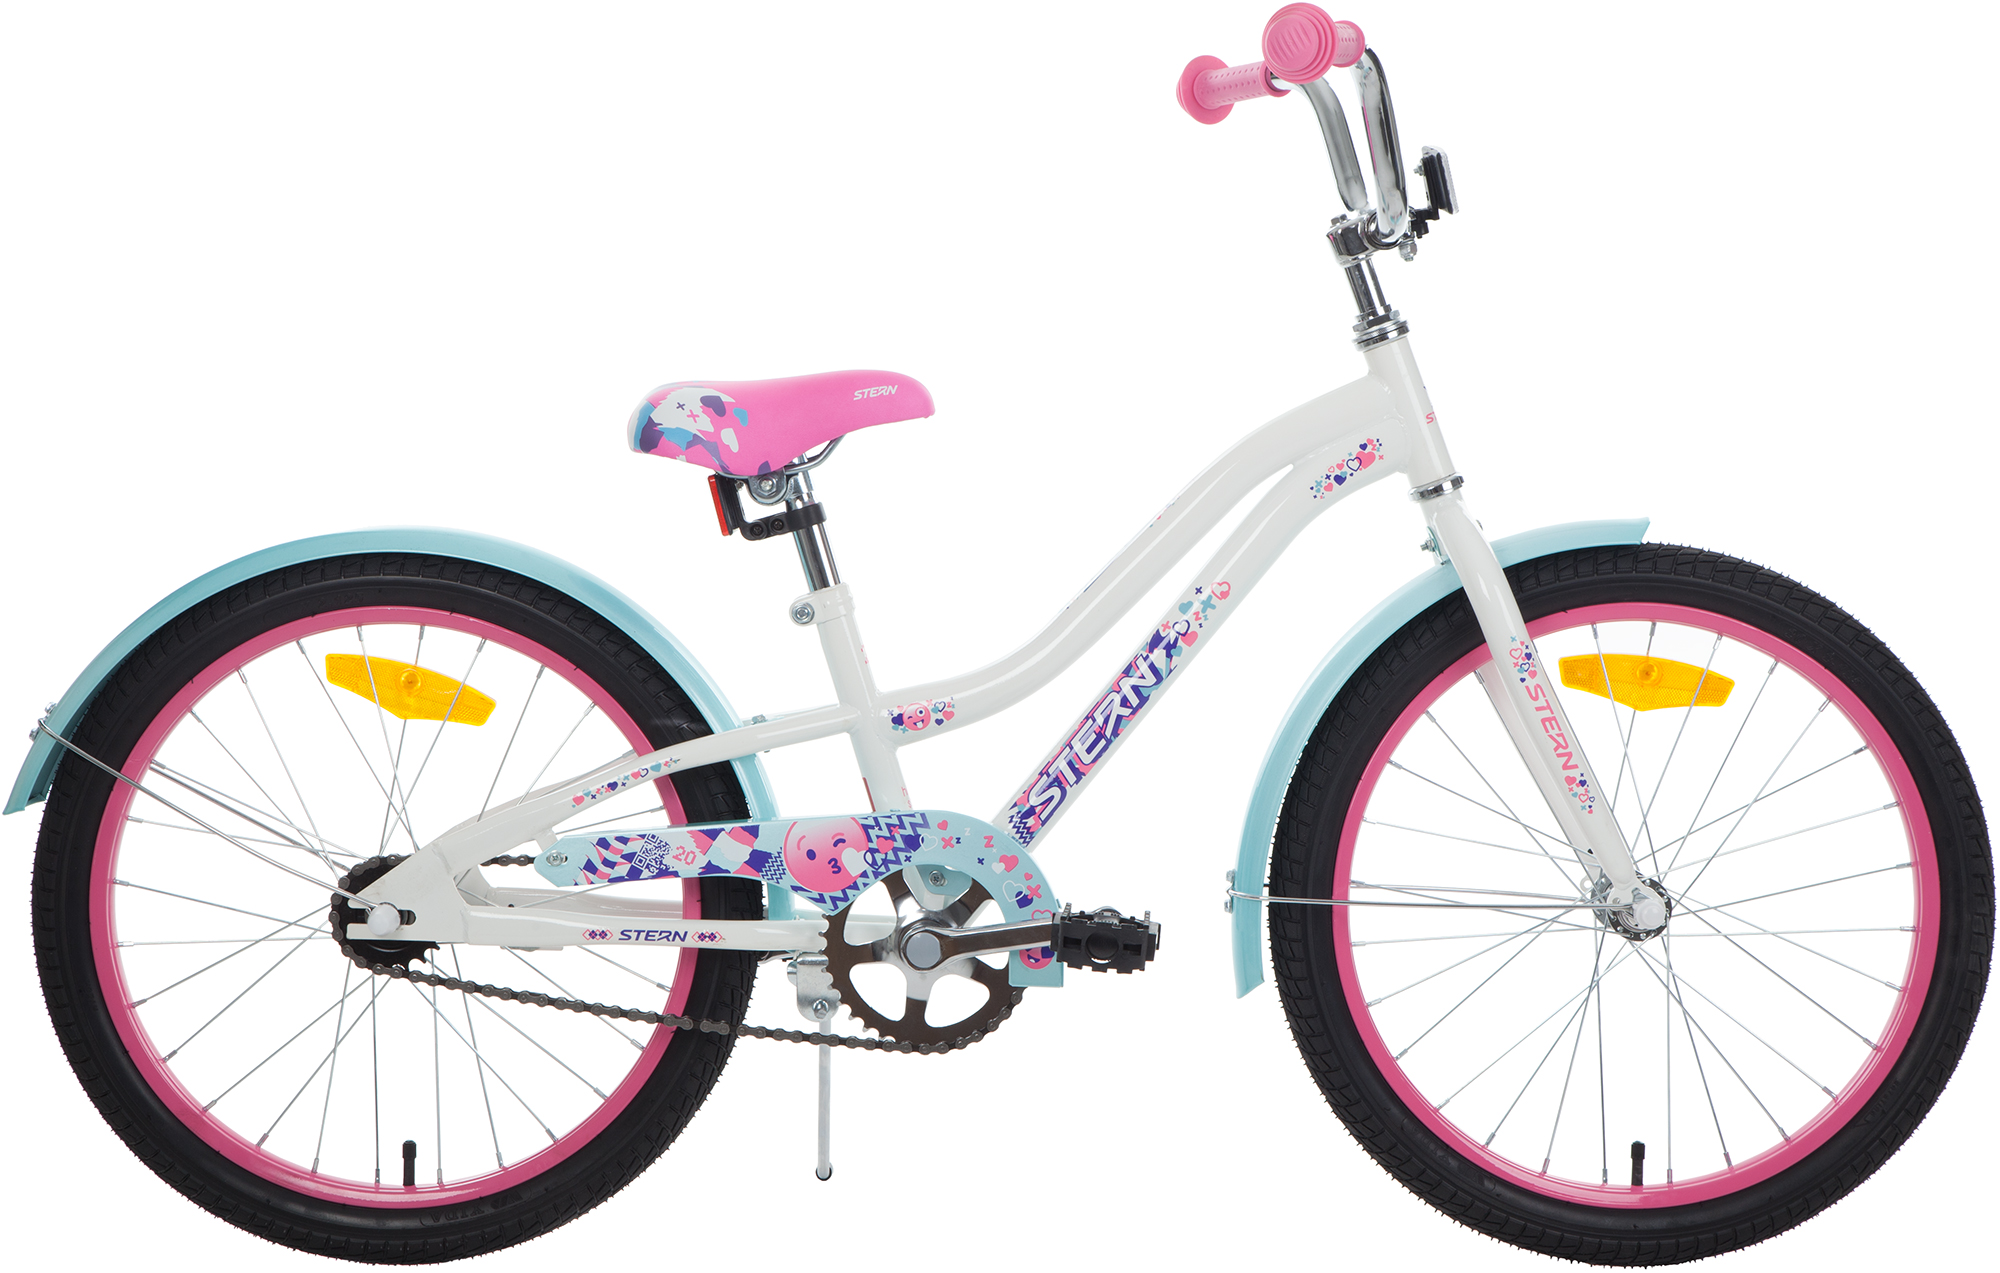 цена на Stern Велосипед подростковый женский Stern Fantasy 20